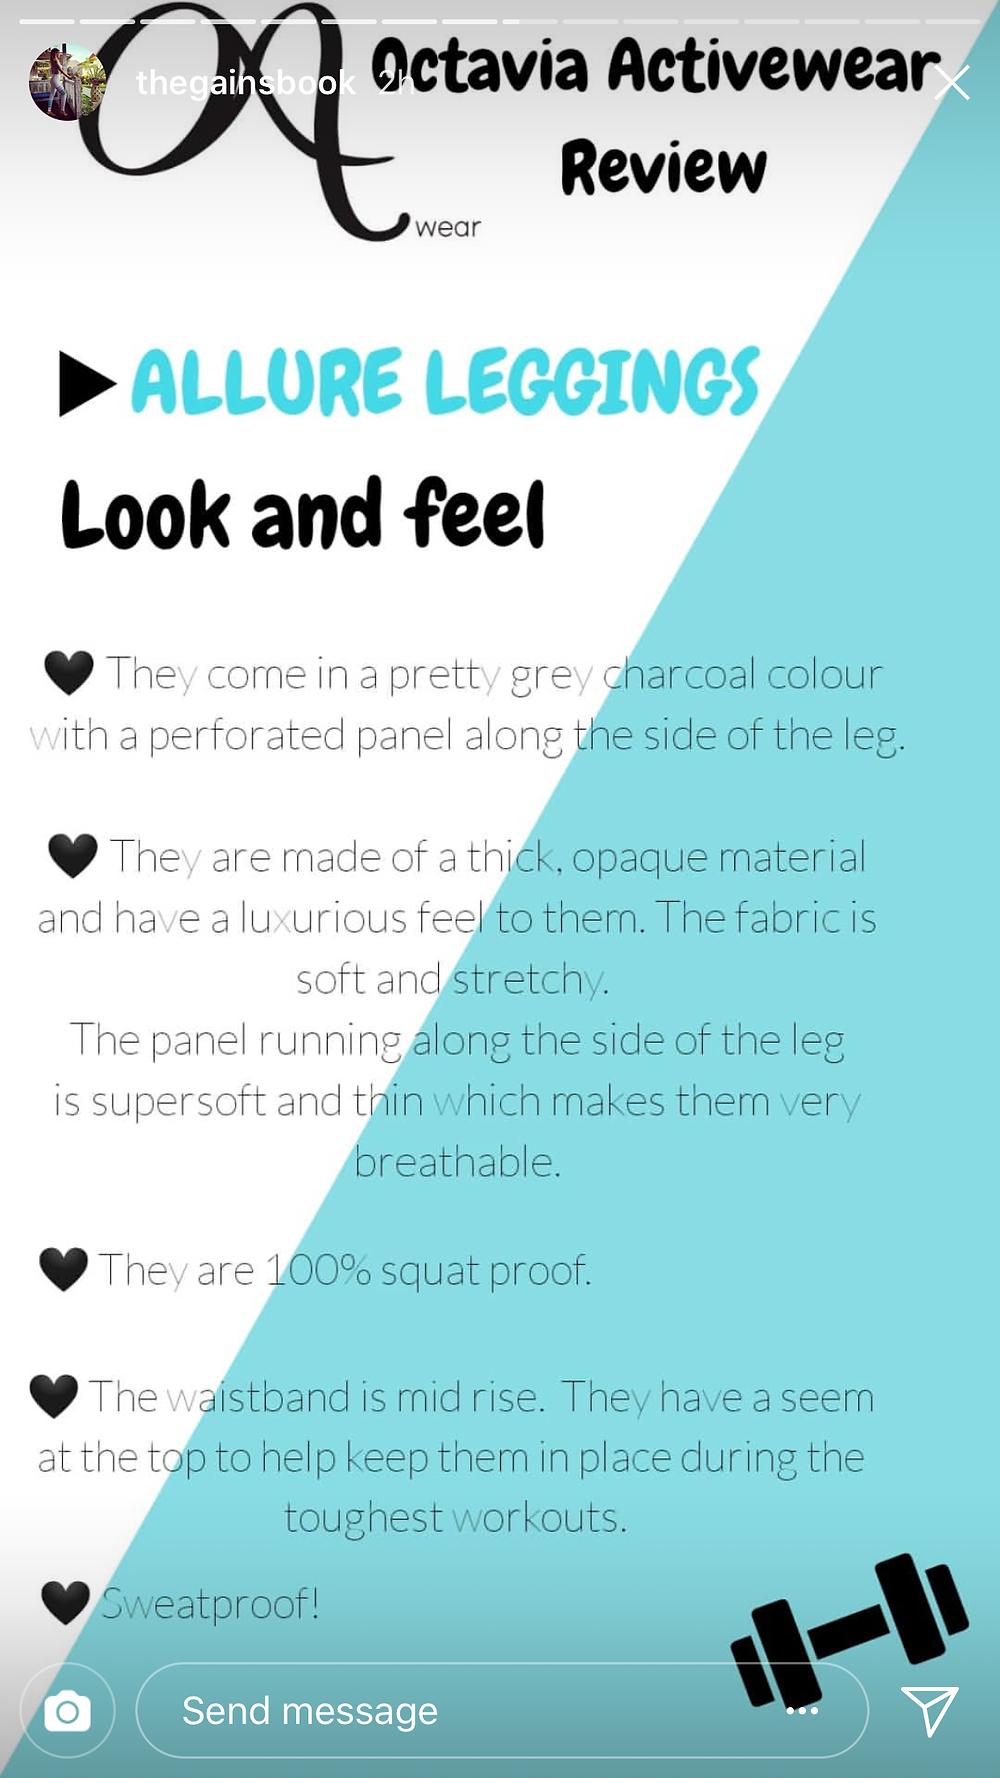 Octavia ACtivewear squat proof leggings review